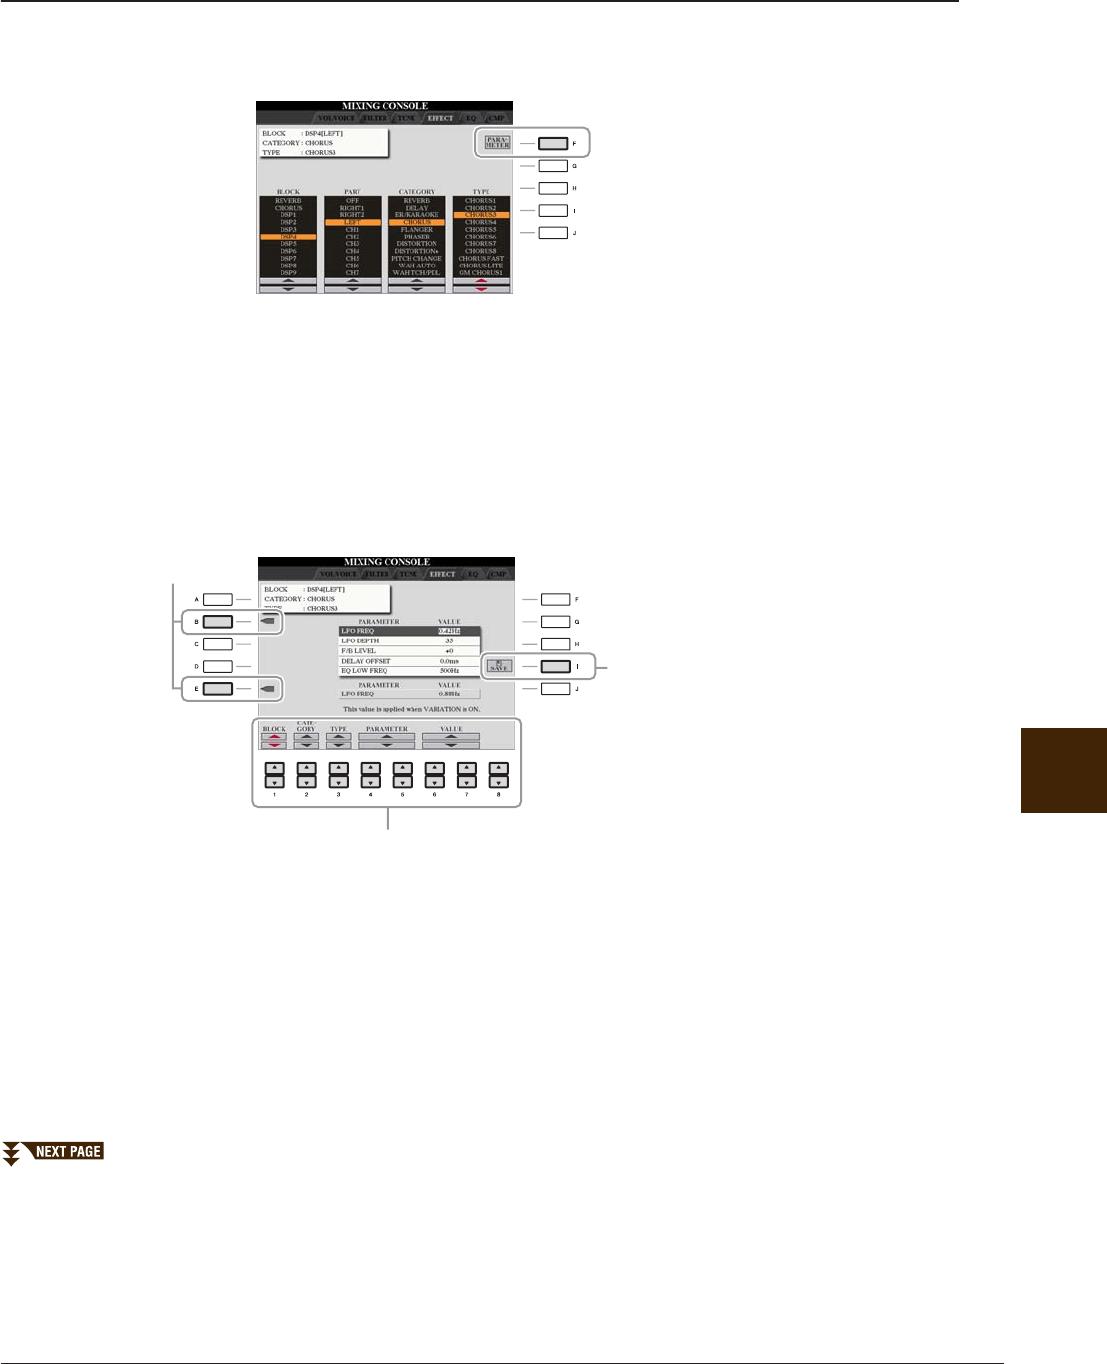 Yamaha CVP 509/505/503/501 Reference Manual English Cvp509